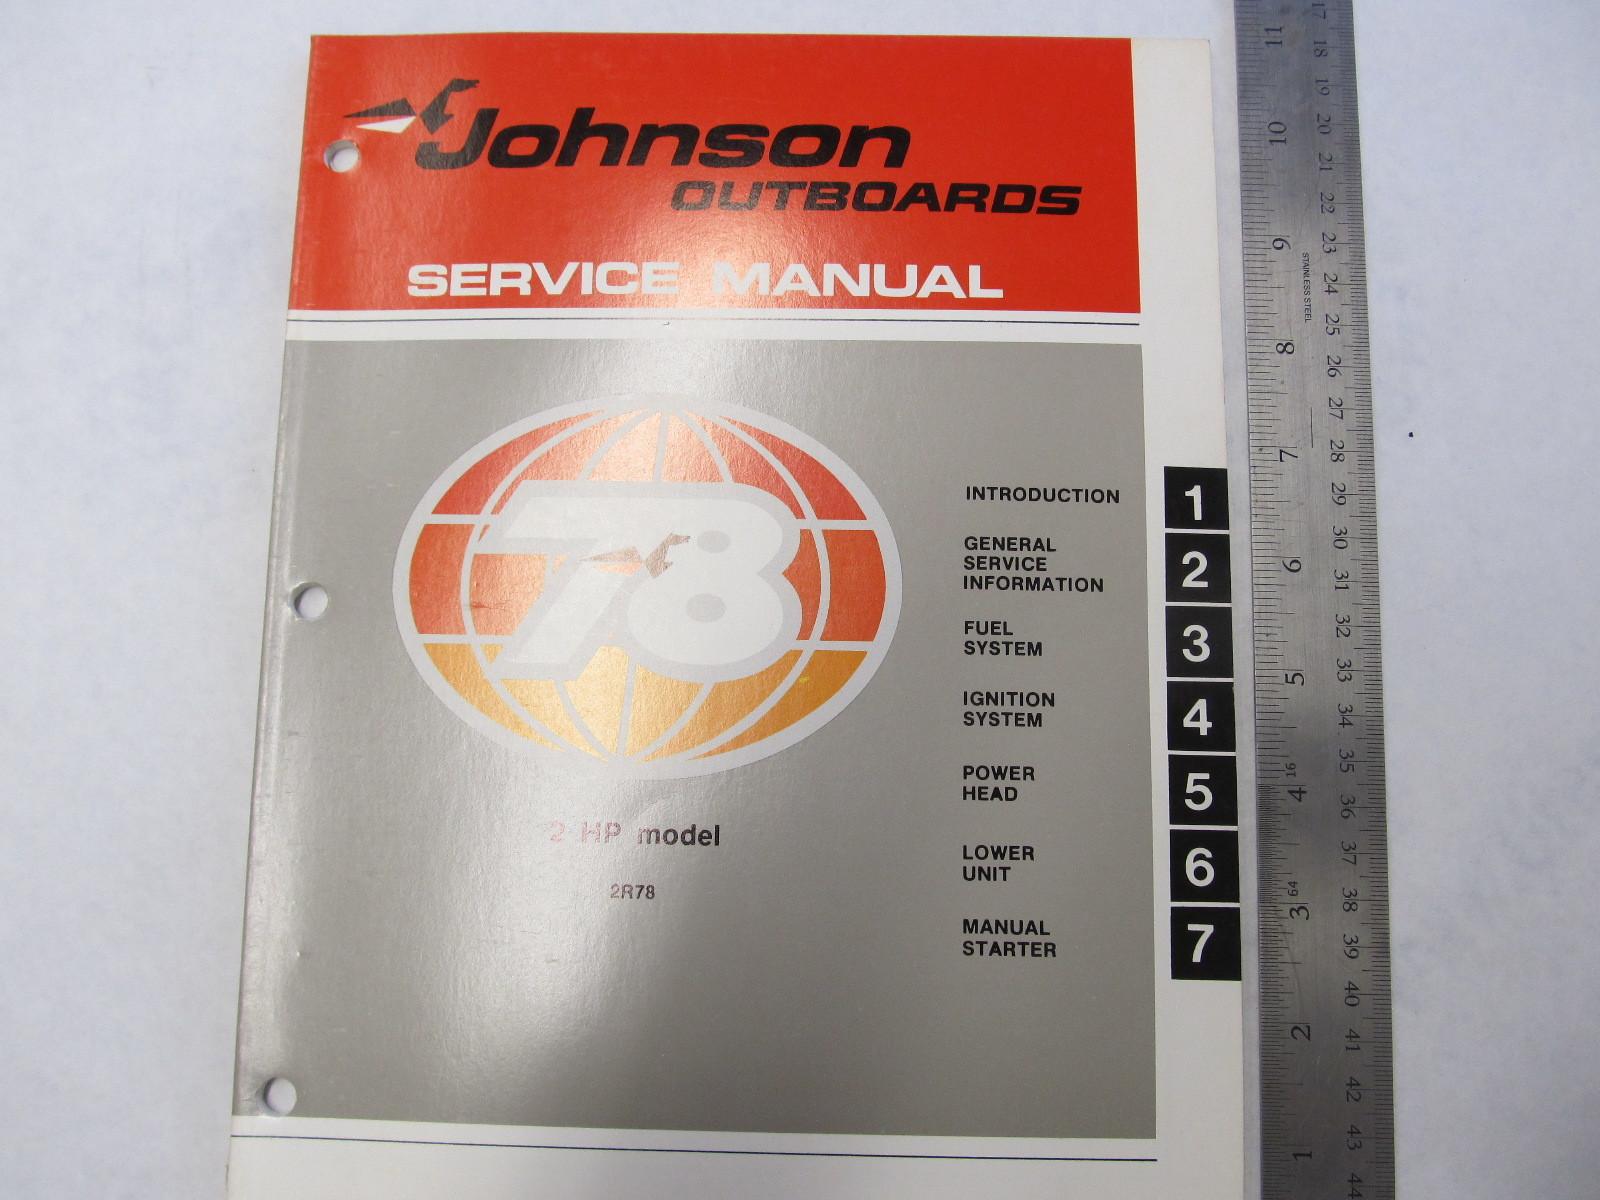 1978 Johnson Outboard Service Manual 2 Hp 2r78